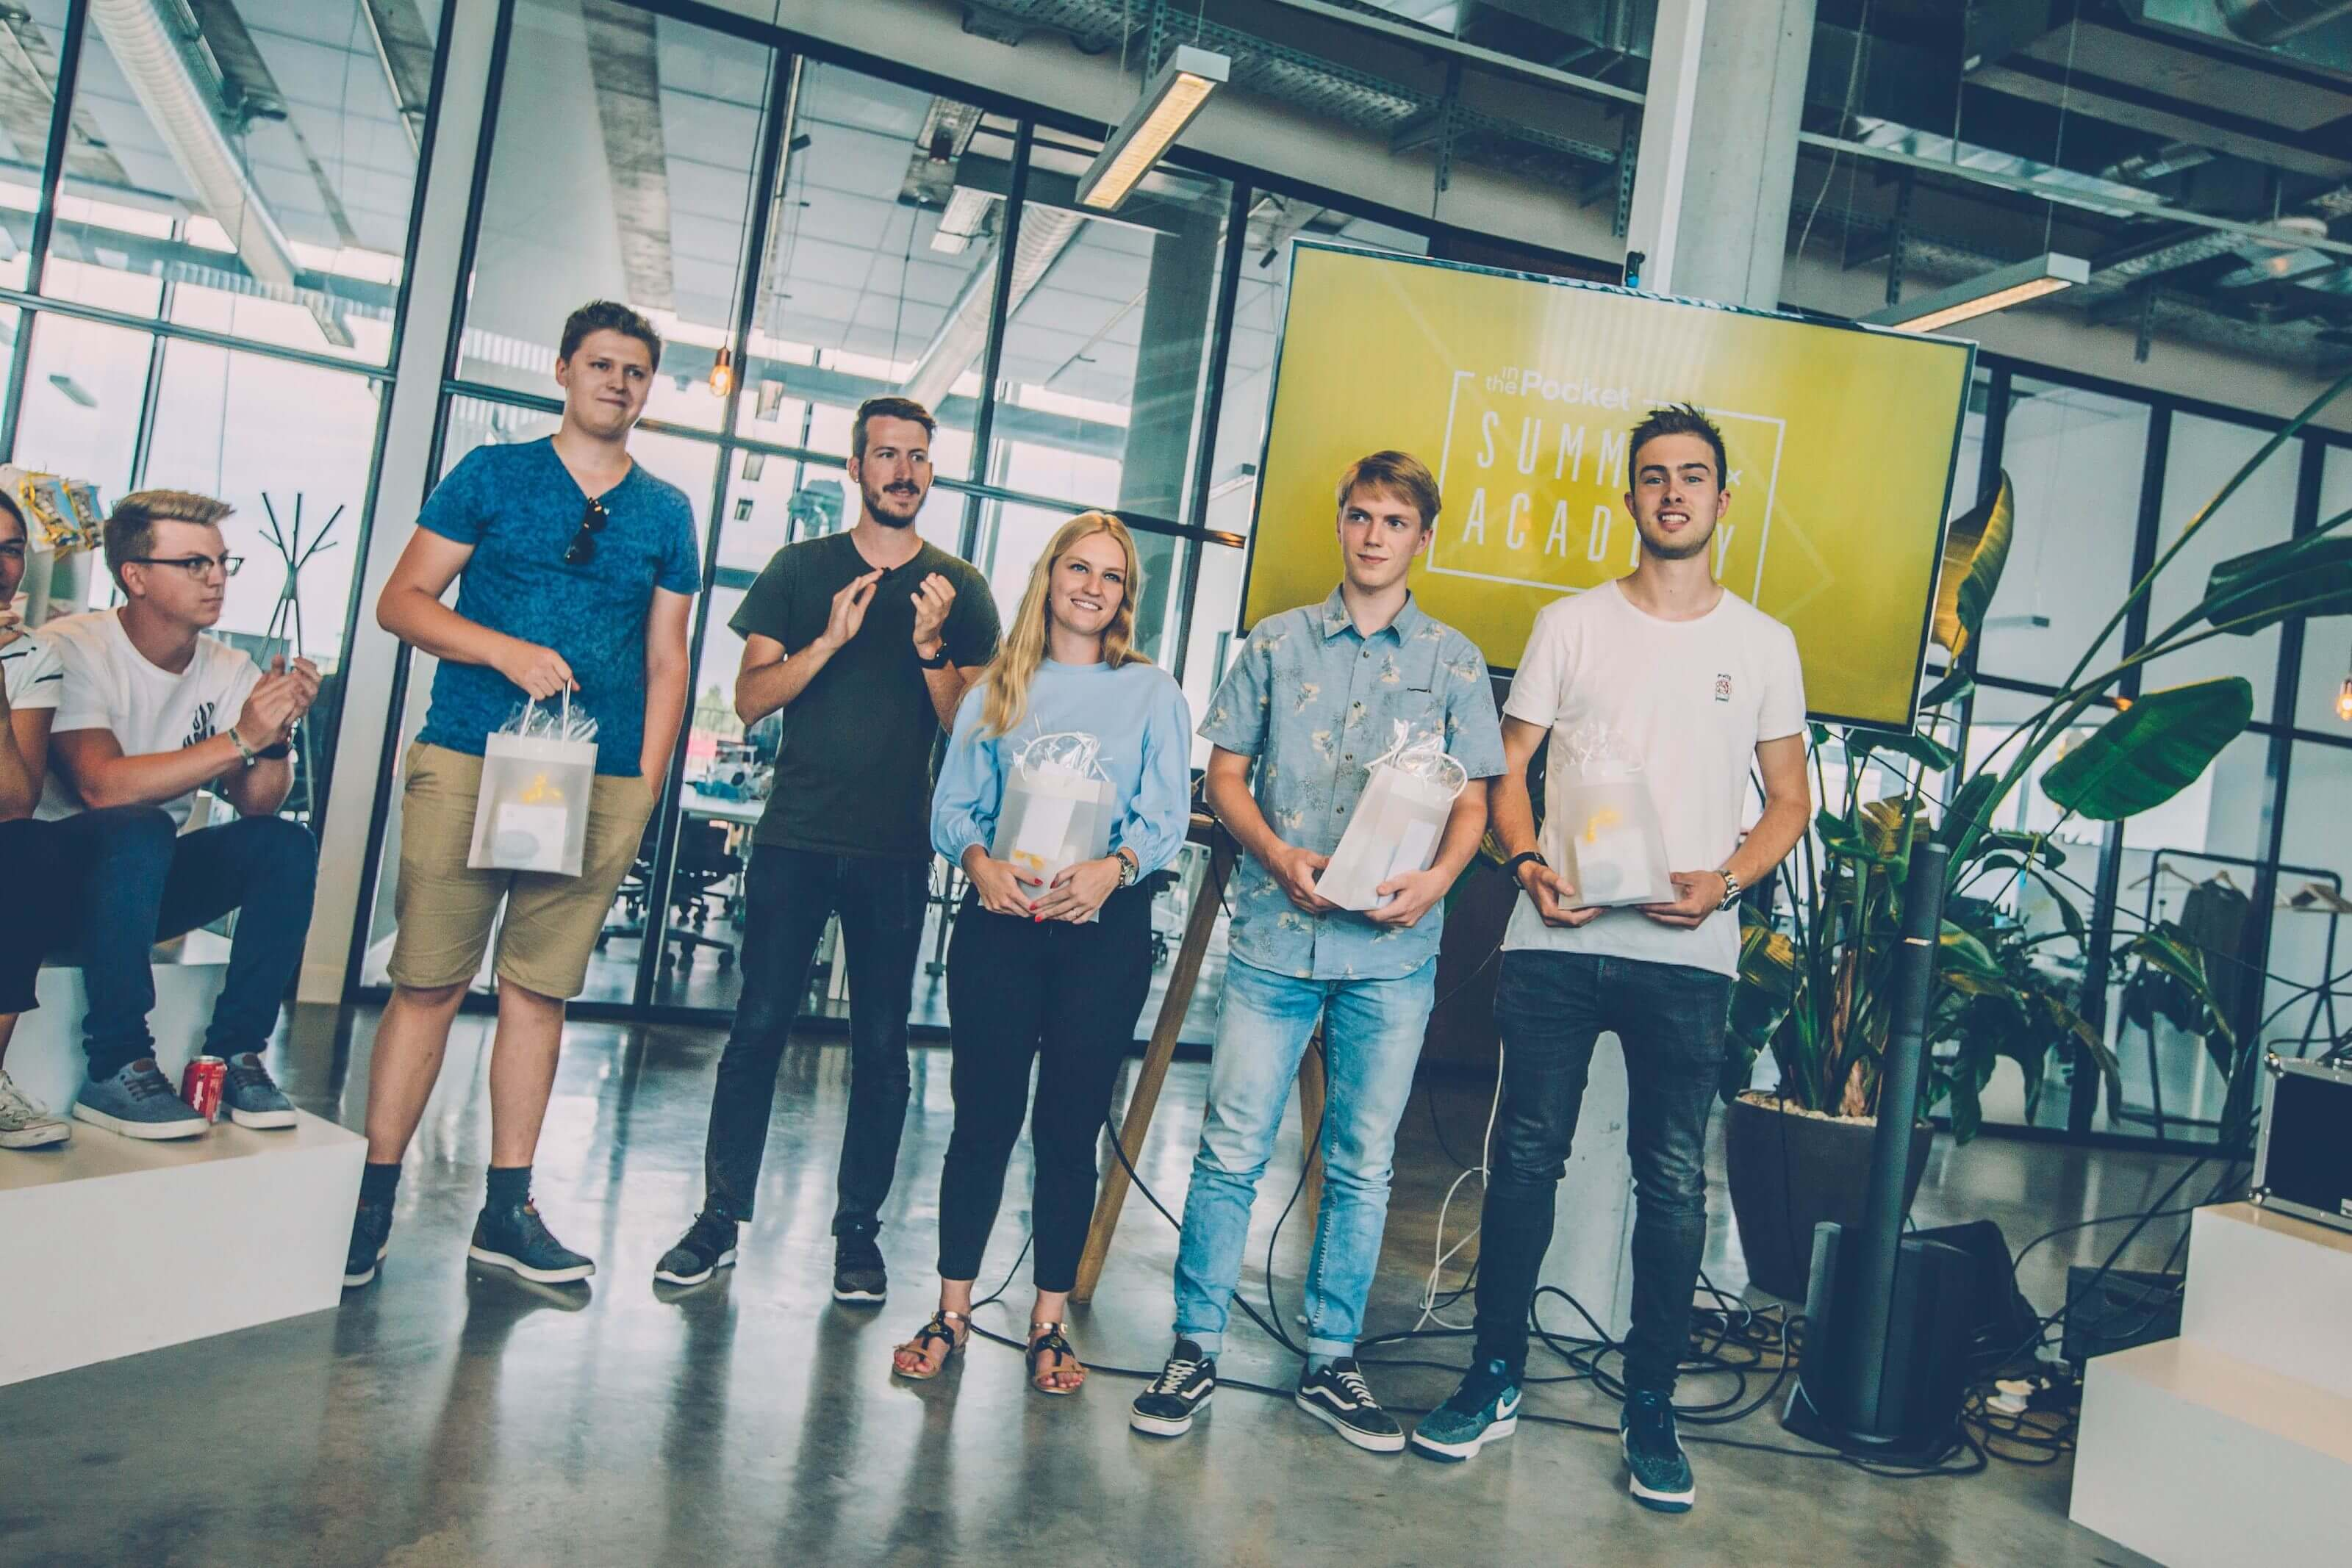 Team 'Kweenie' wins the Summer Academy